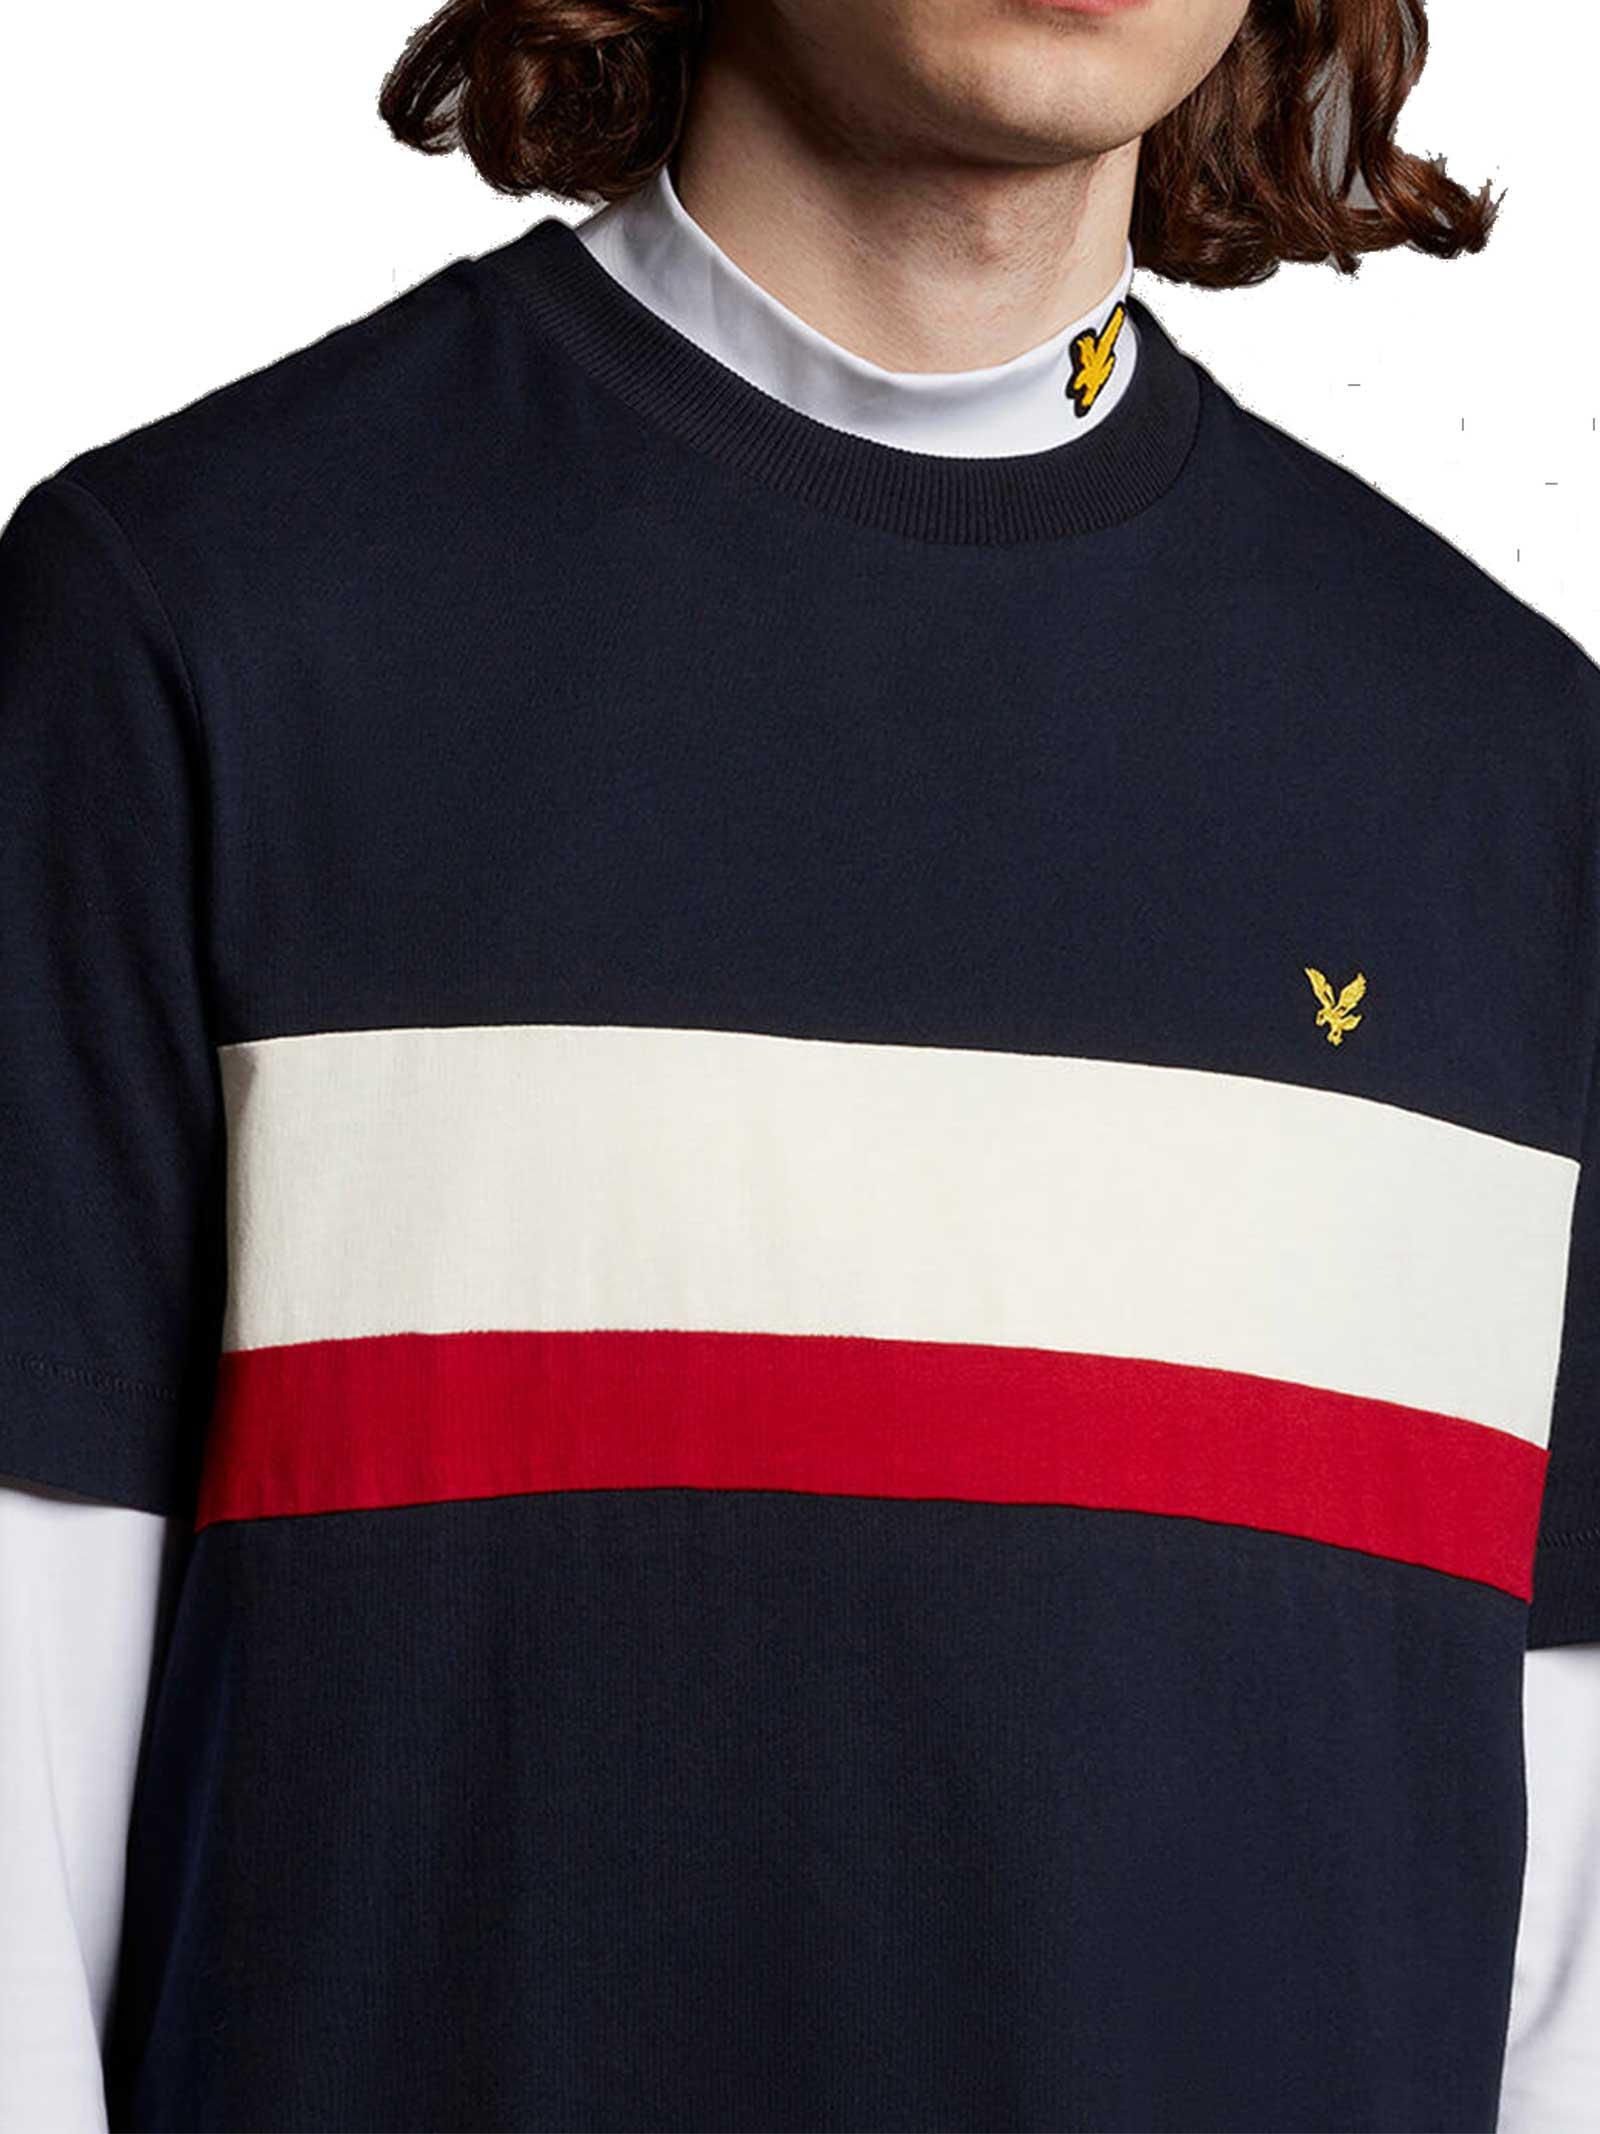 T-SHIRT UOMO LYLE & SCOTT   T-shirt   TS1451VZ271